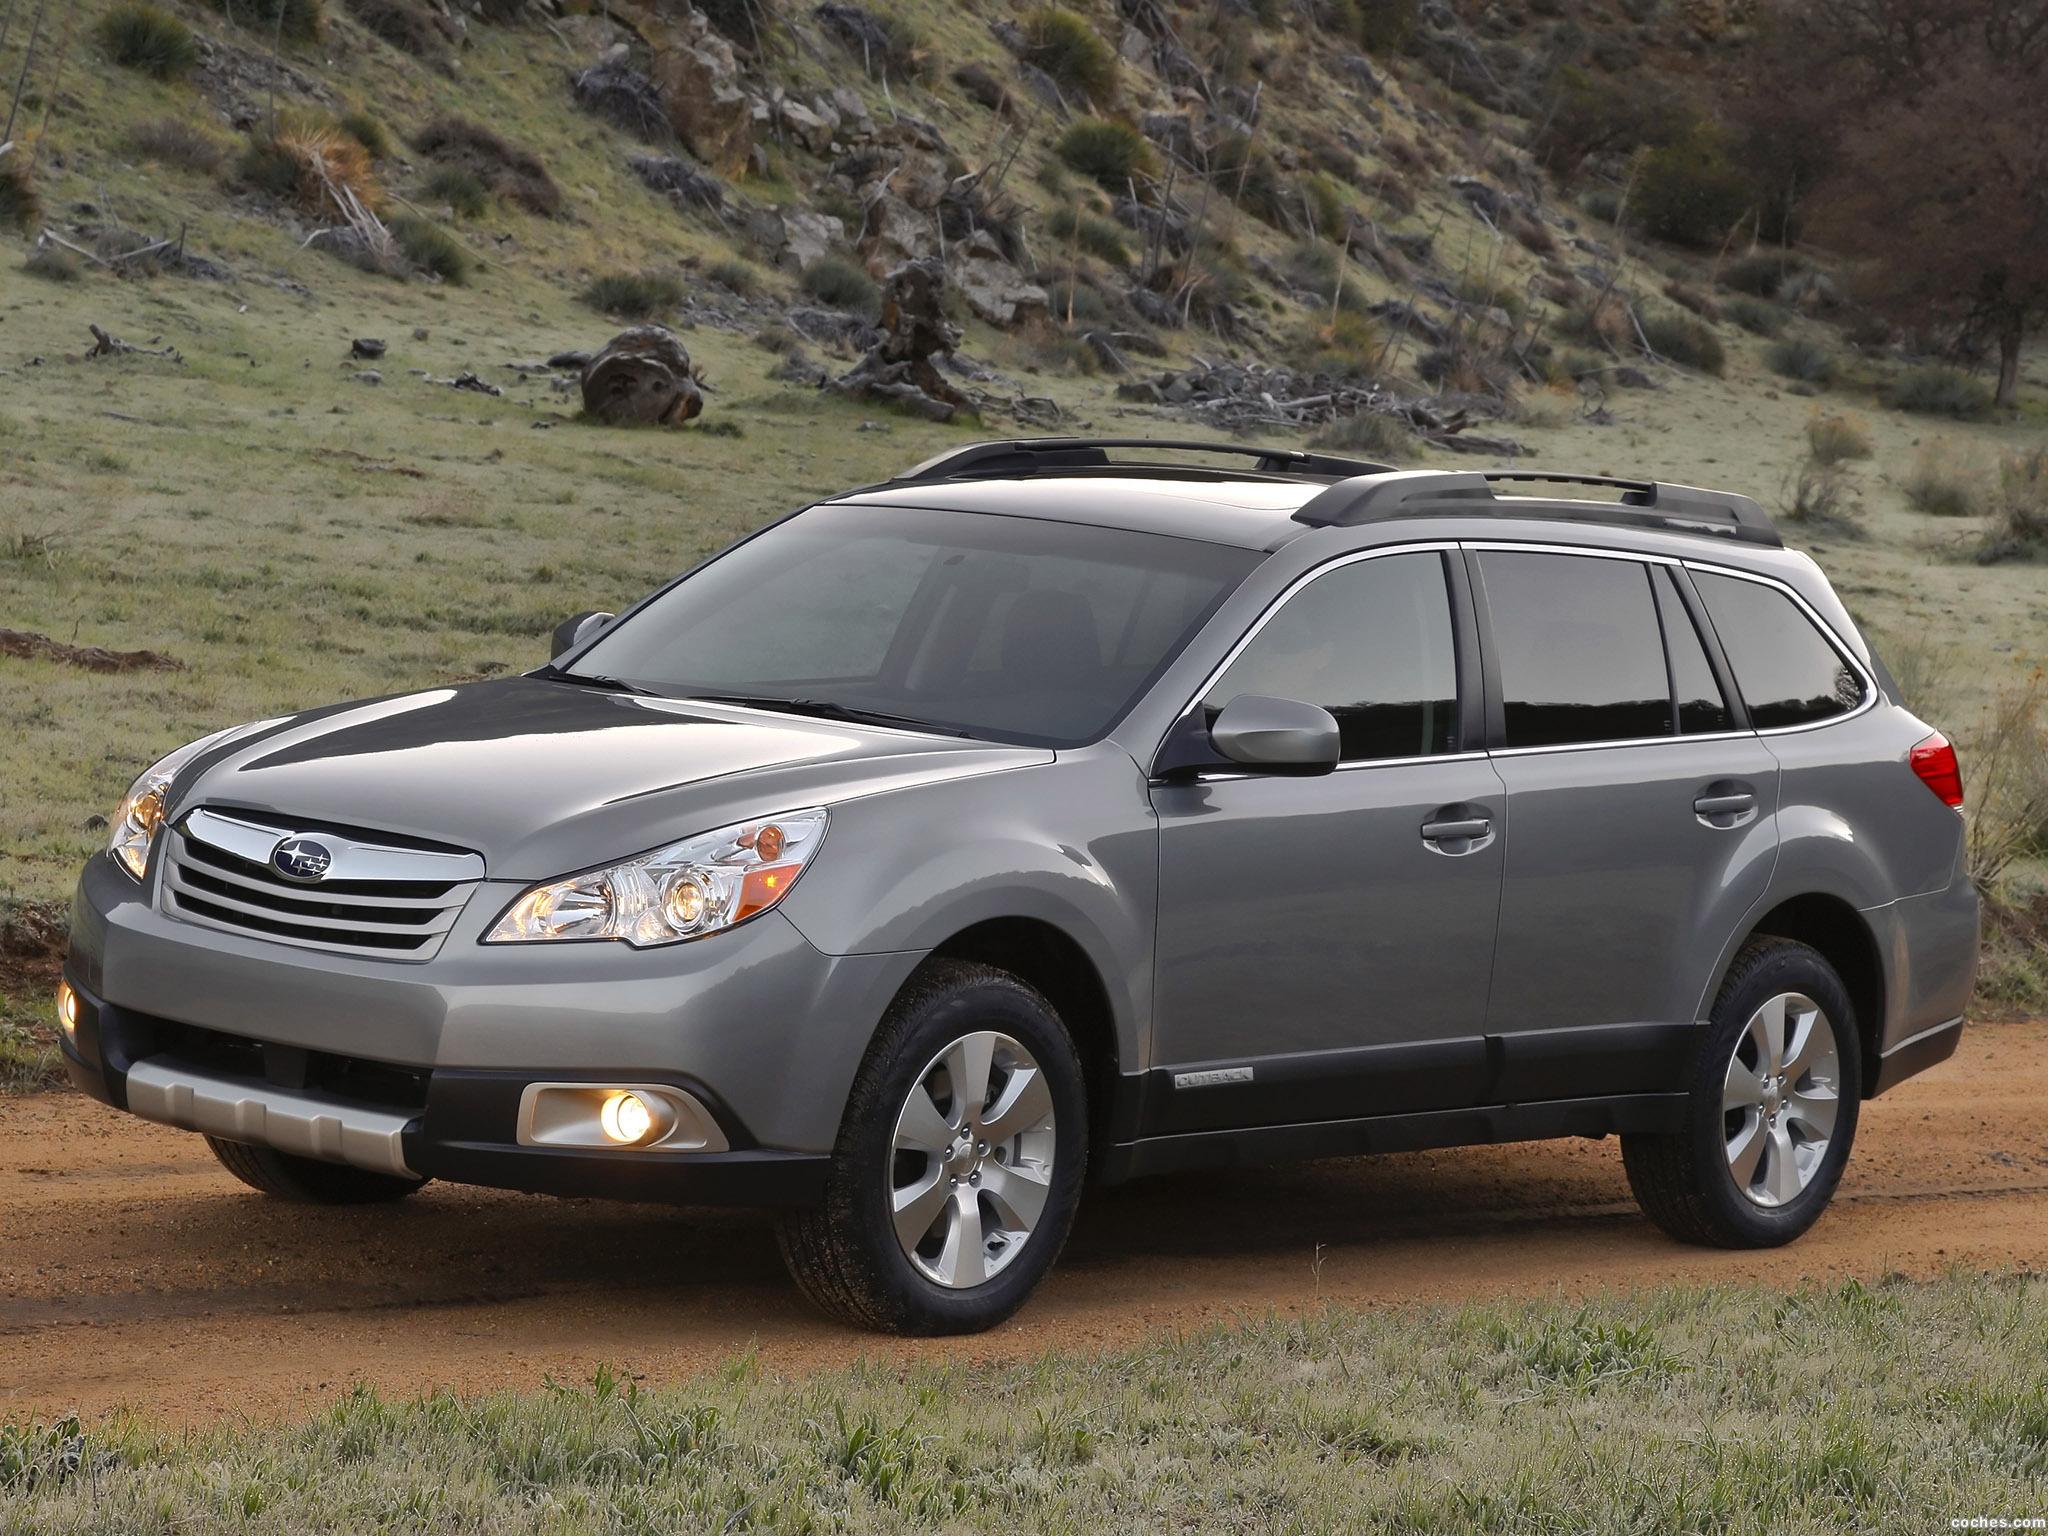 Foto 8 de Subaru Outback 3.6R 2009